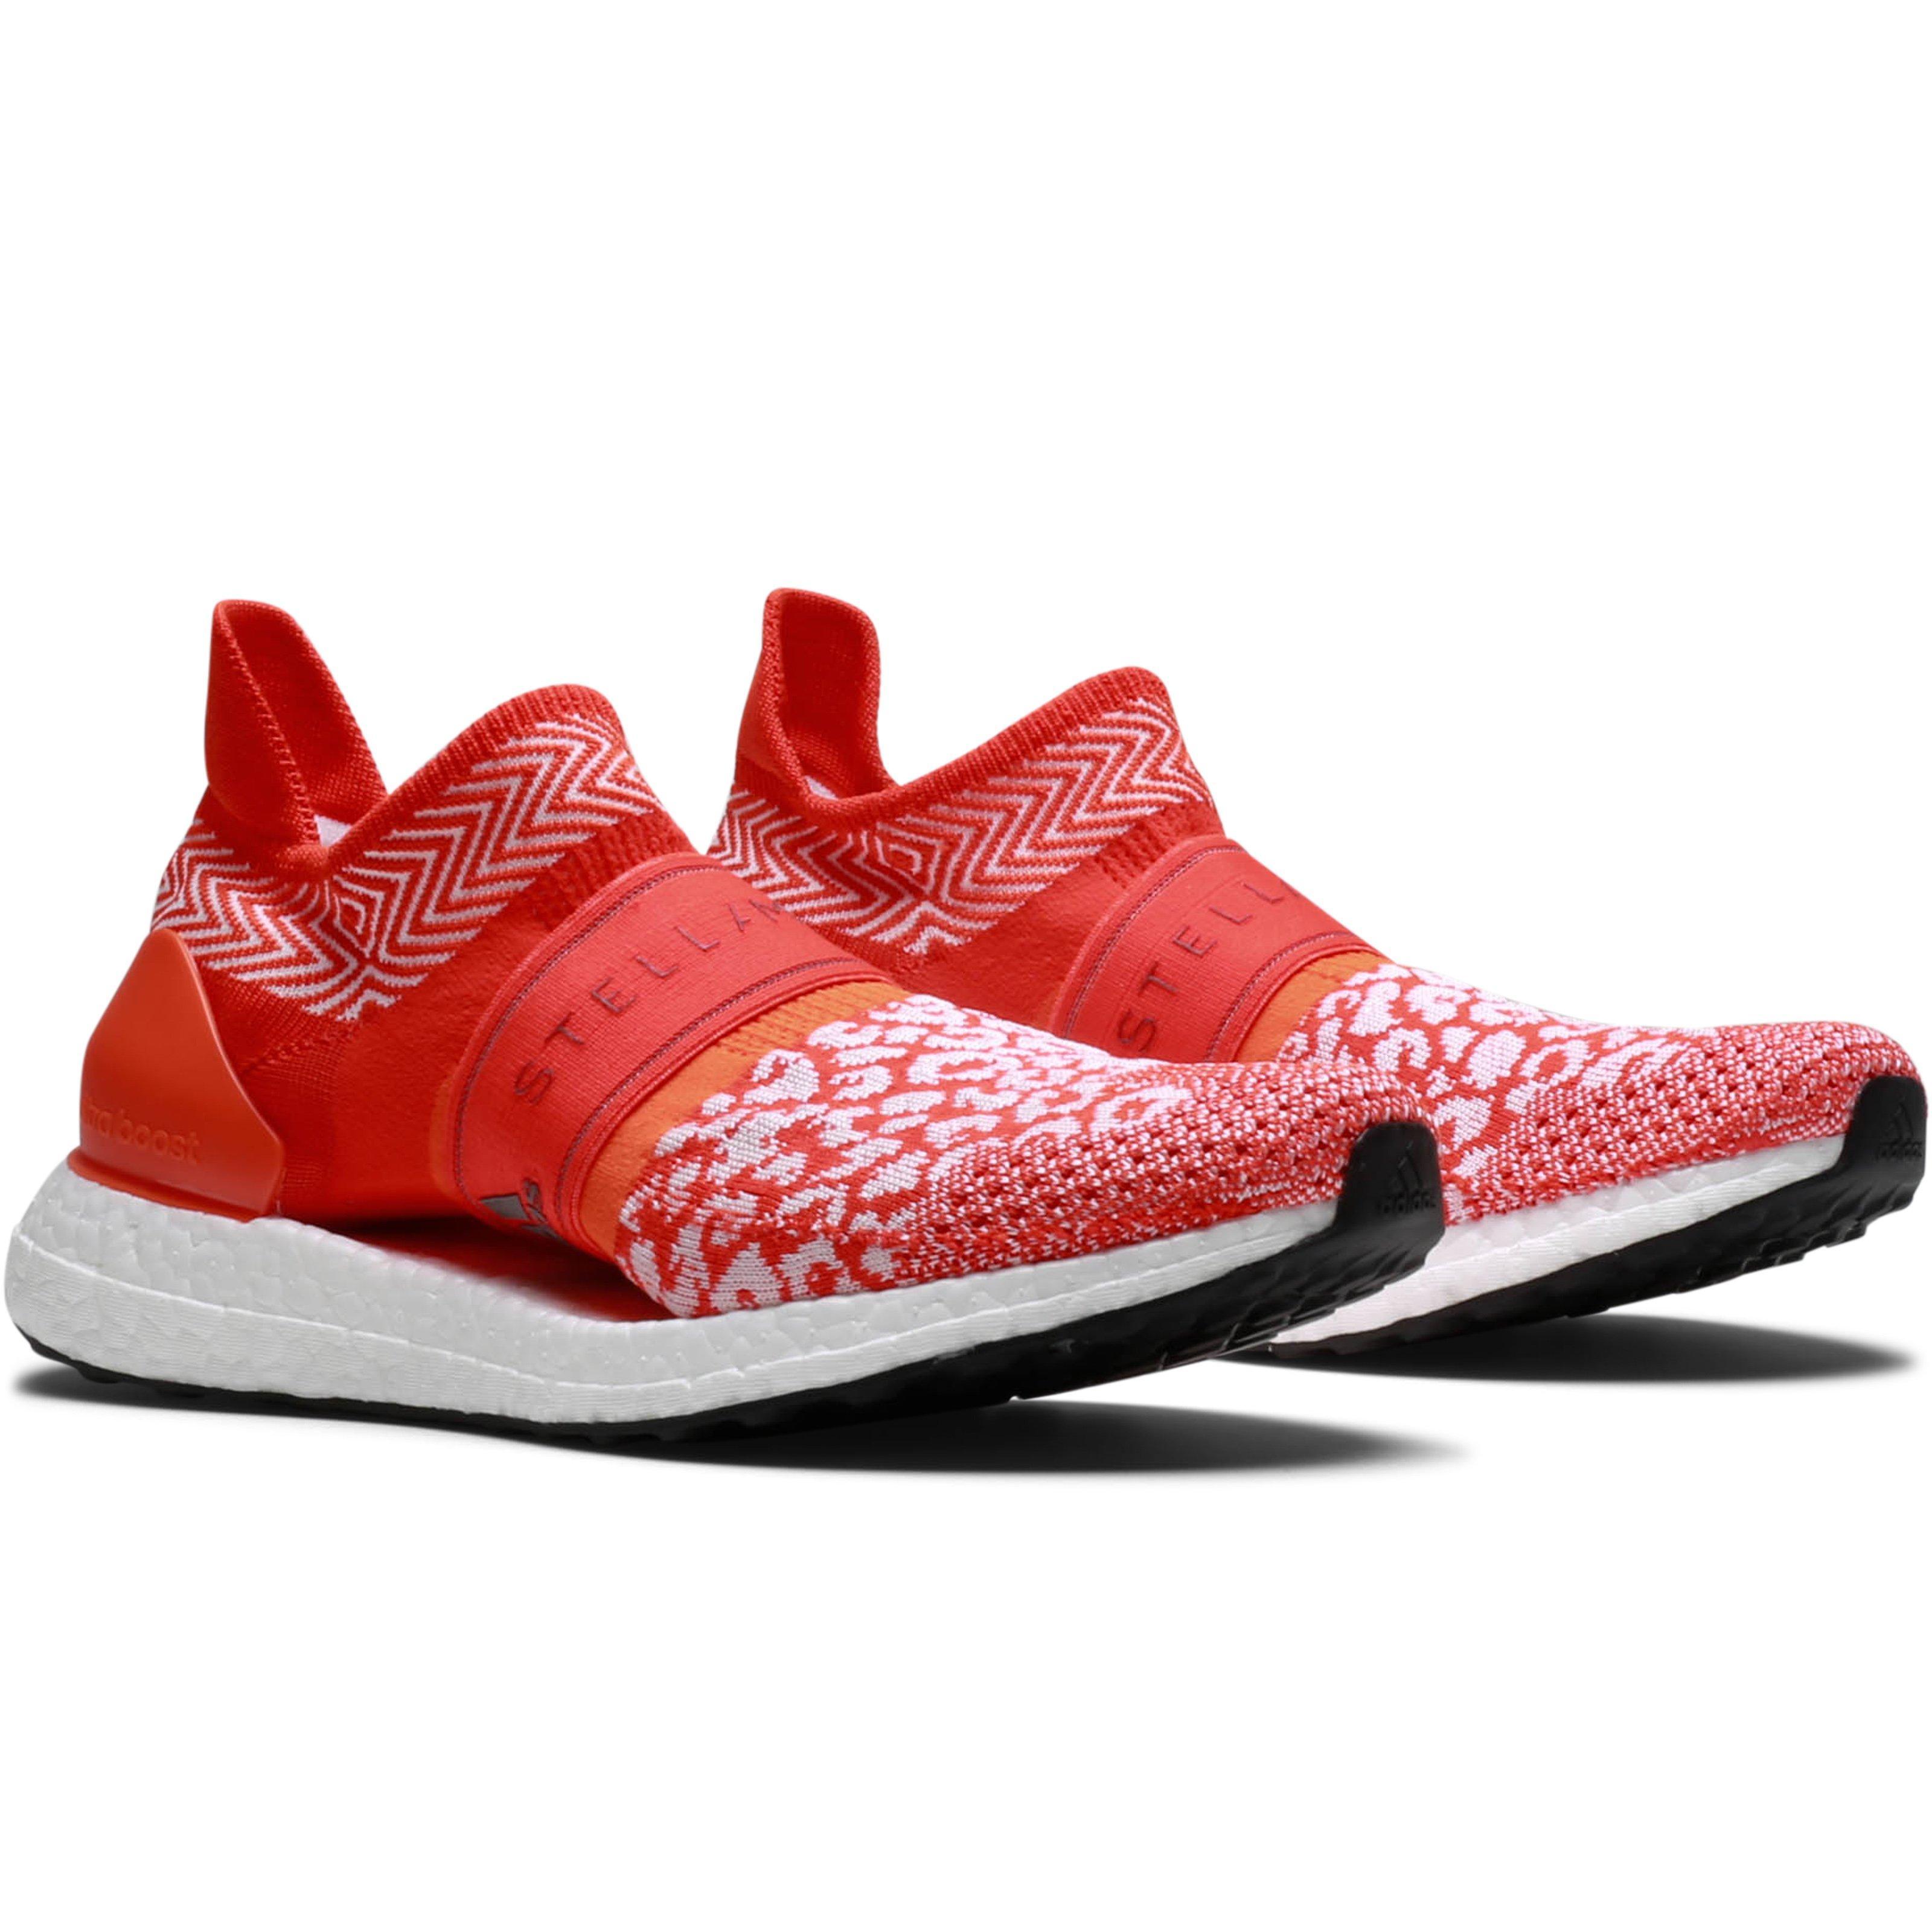 531b5765d Adidas - Red X Stella Mccartney Women s Ultraboost X 3d - Lyst. View  fullscreen